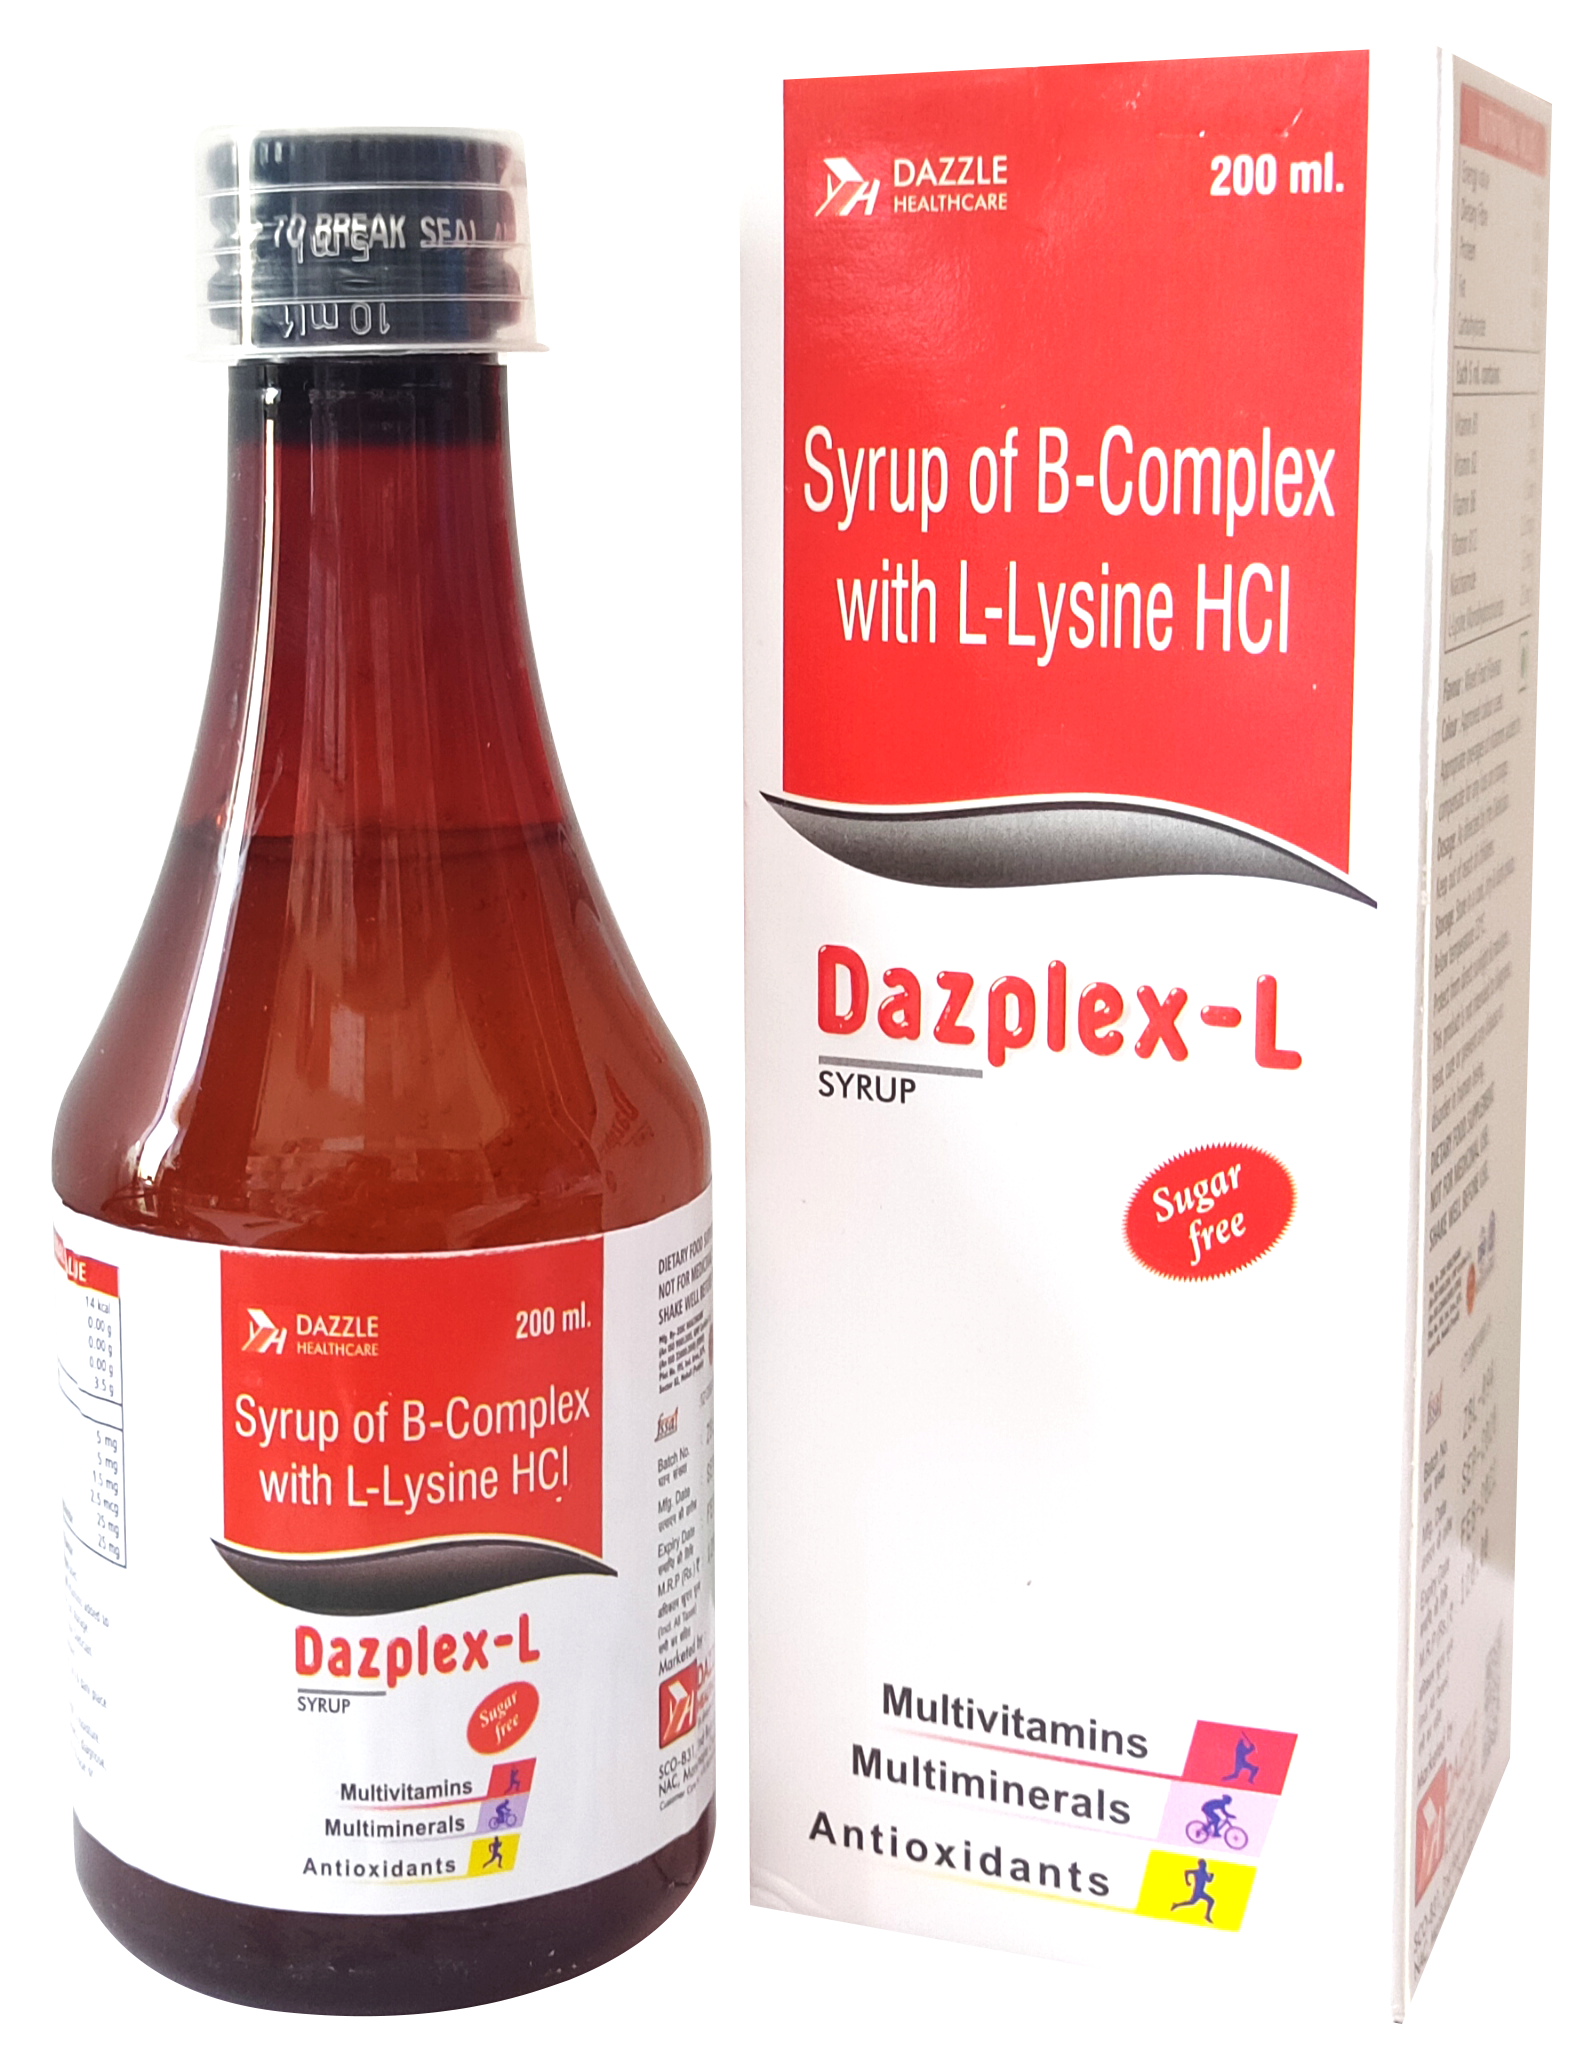 DAZPLEX 200ML SYP